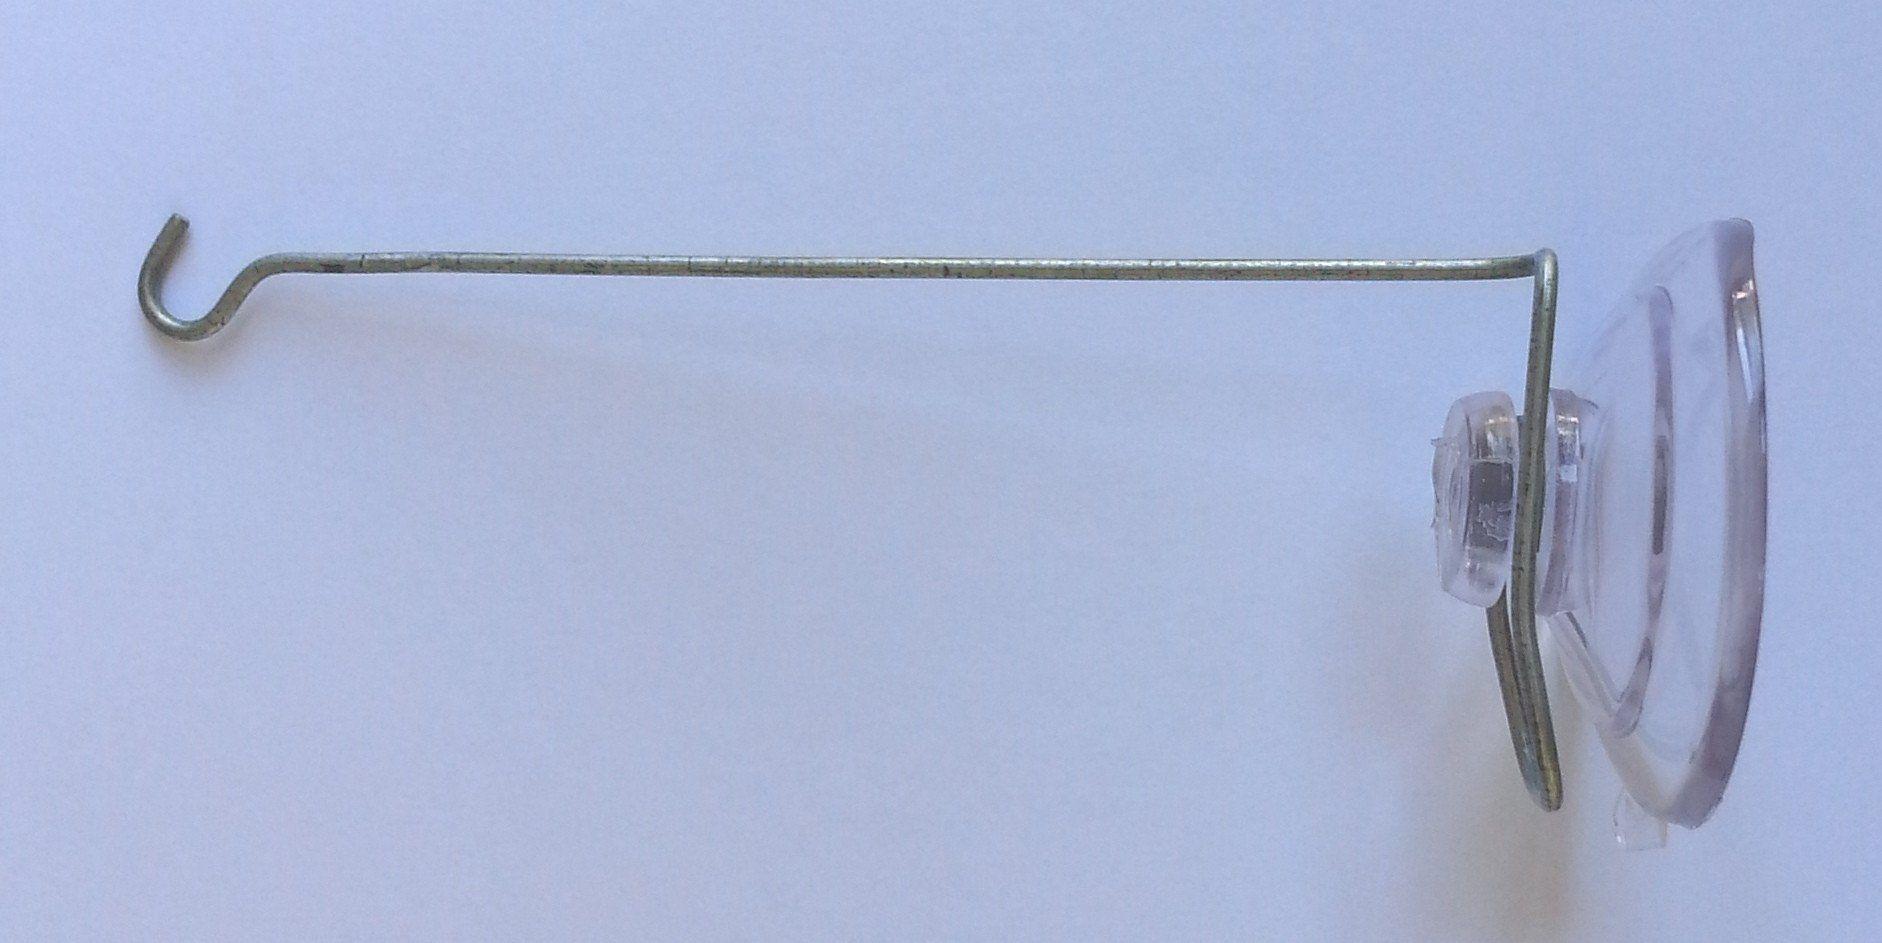 4 Inch Metal Window Hanger W Suction Cup Cinespinner Suncatcher  # Muebles Peekskill